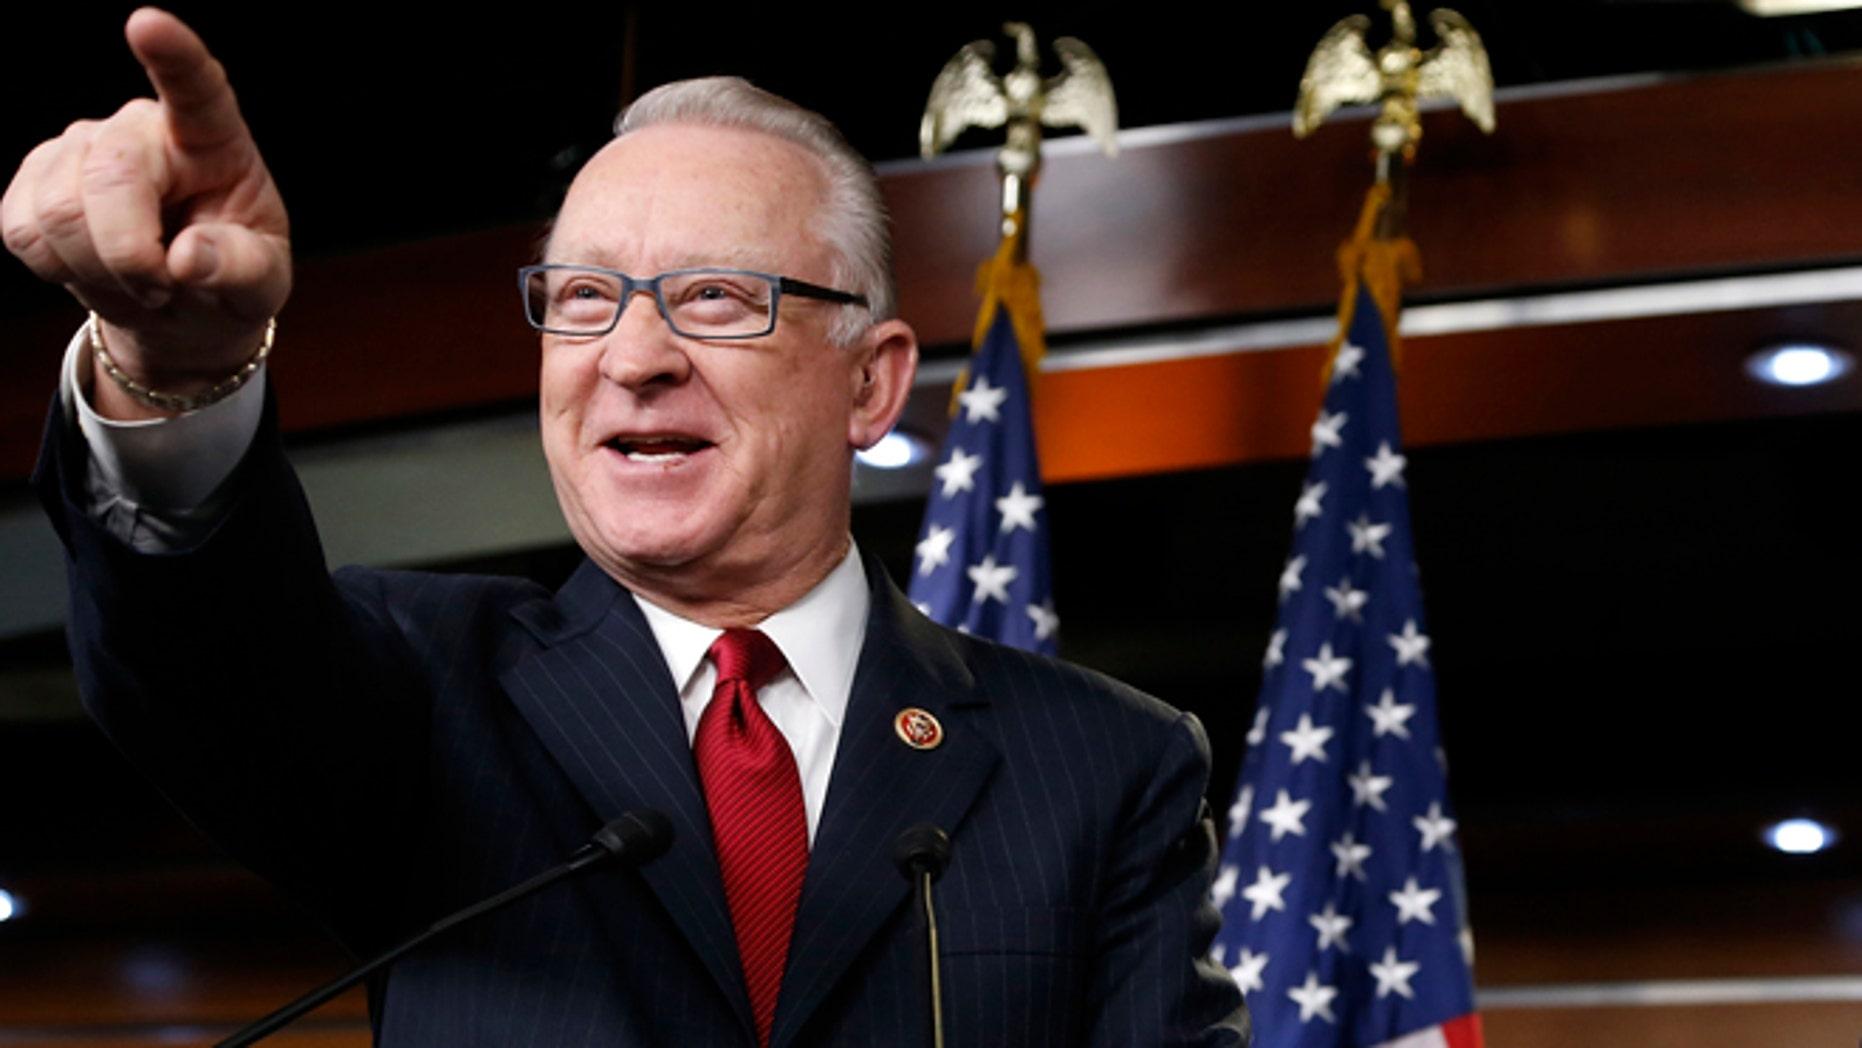 FILE: Dec. 9, 2013: Rep. Buck McKeon, R-Calif., at the U.S. Capitol in Washington, D.C.